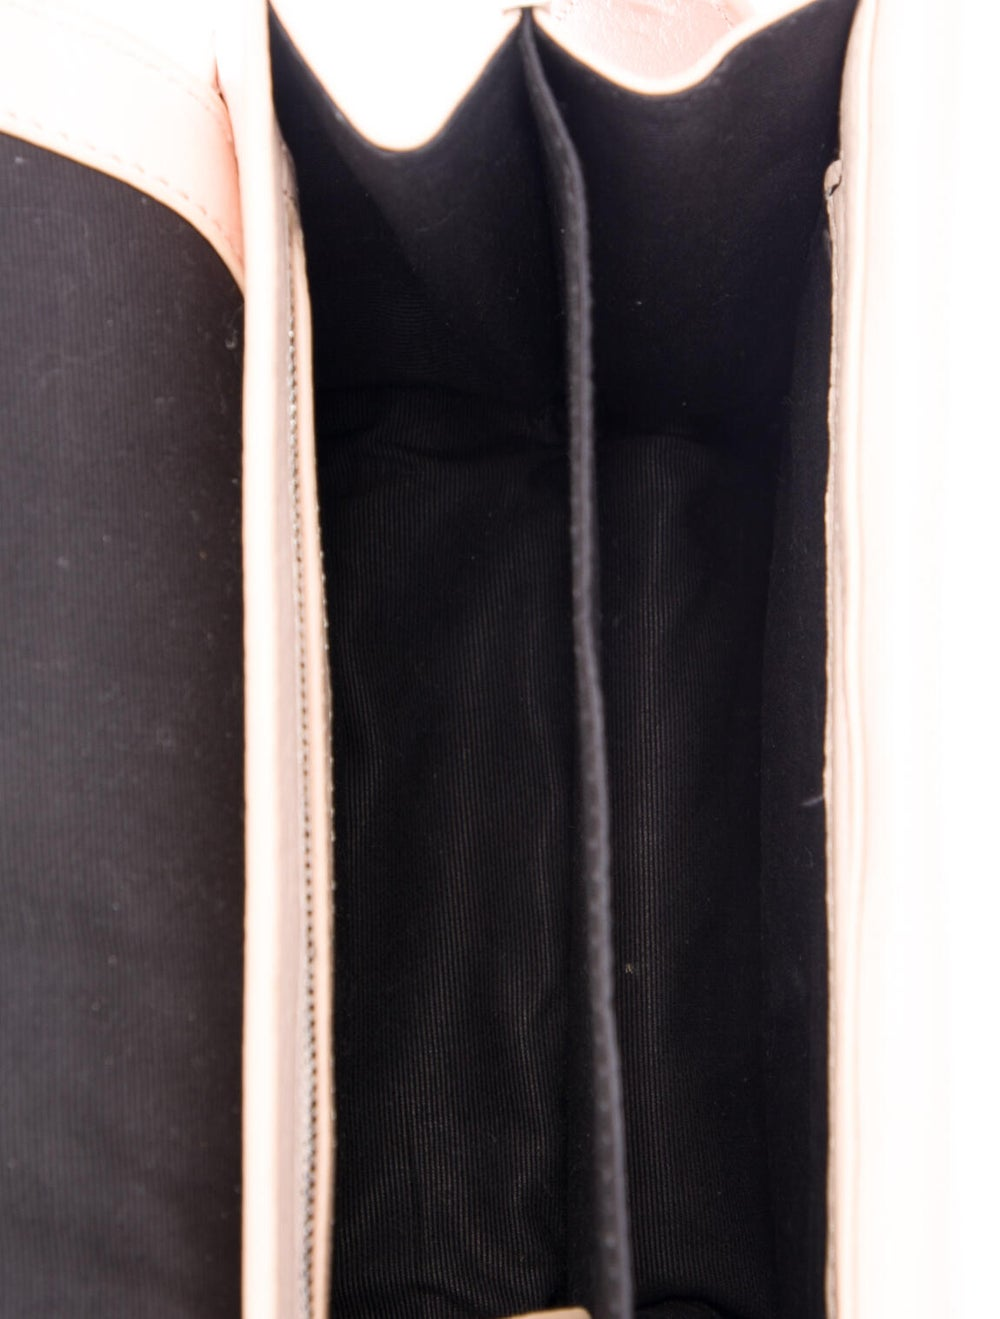 Steven Alan Leather Crossbody Bag Pink - image 5